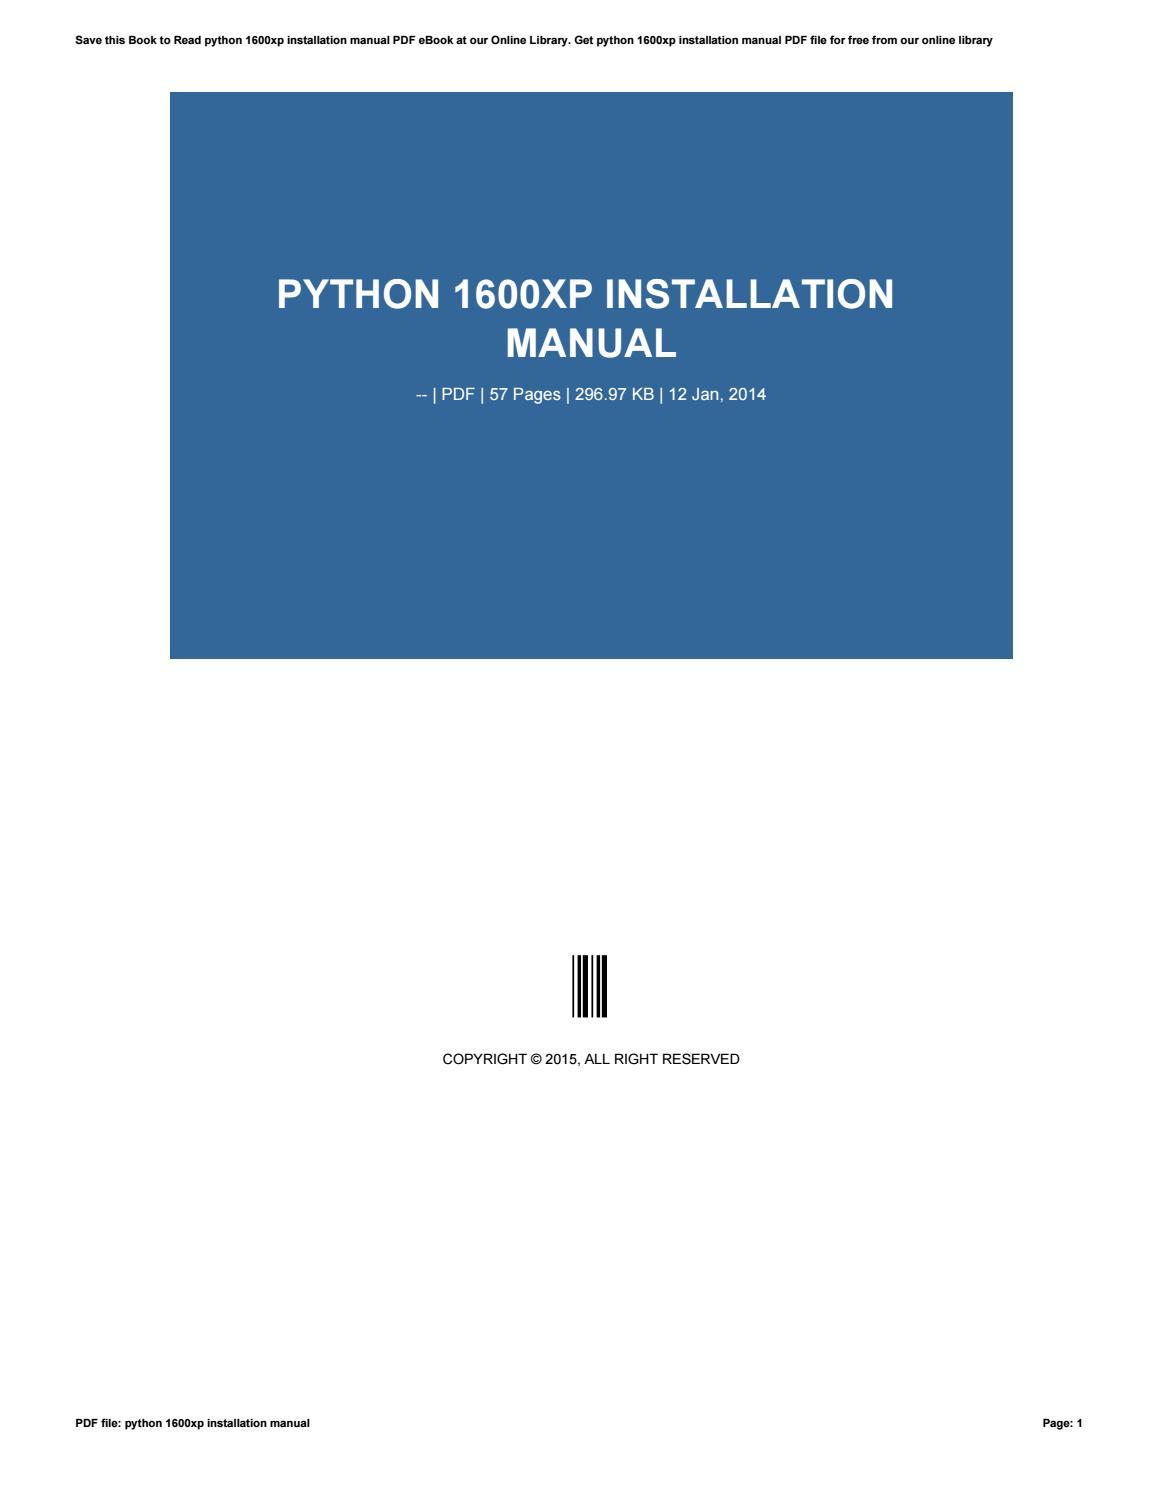 ... Array - acer g236hl manual ebook rh acer g236hl manual ebook cpsplus eu